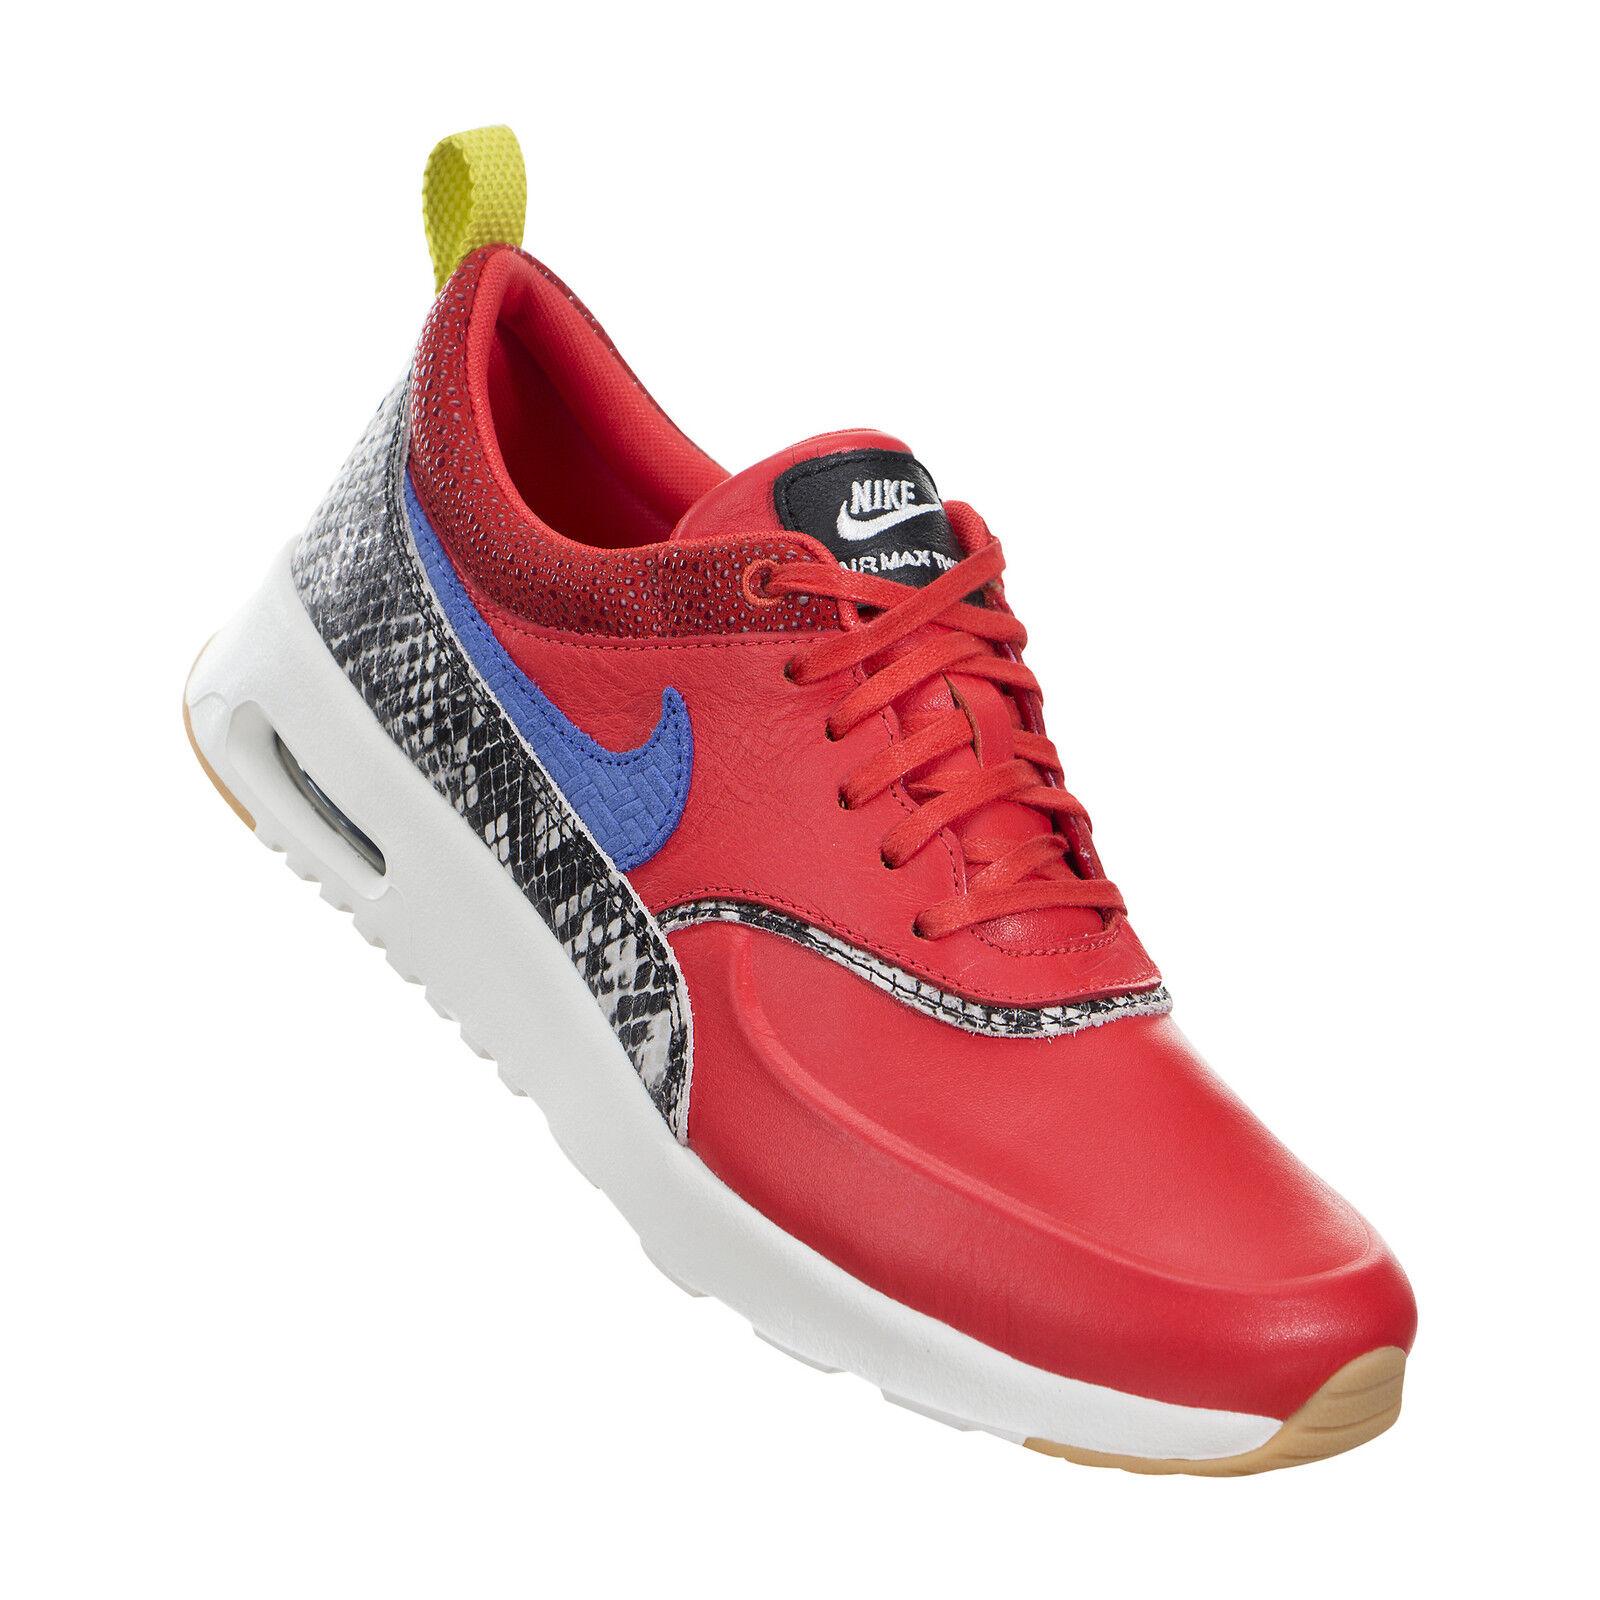 Women's Nike Air Max Thea LX, Size 5.5  (881203-800)